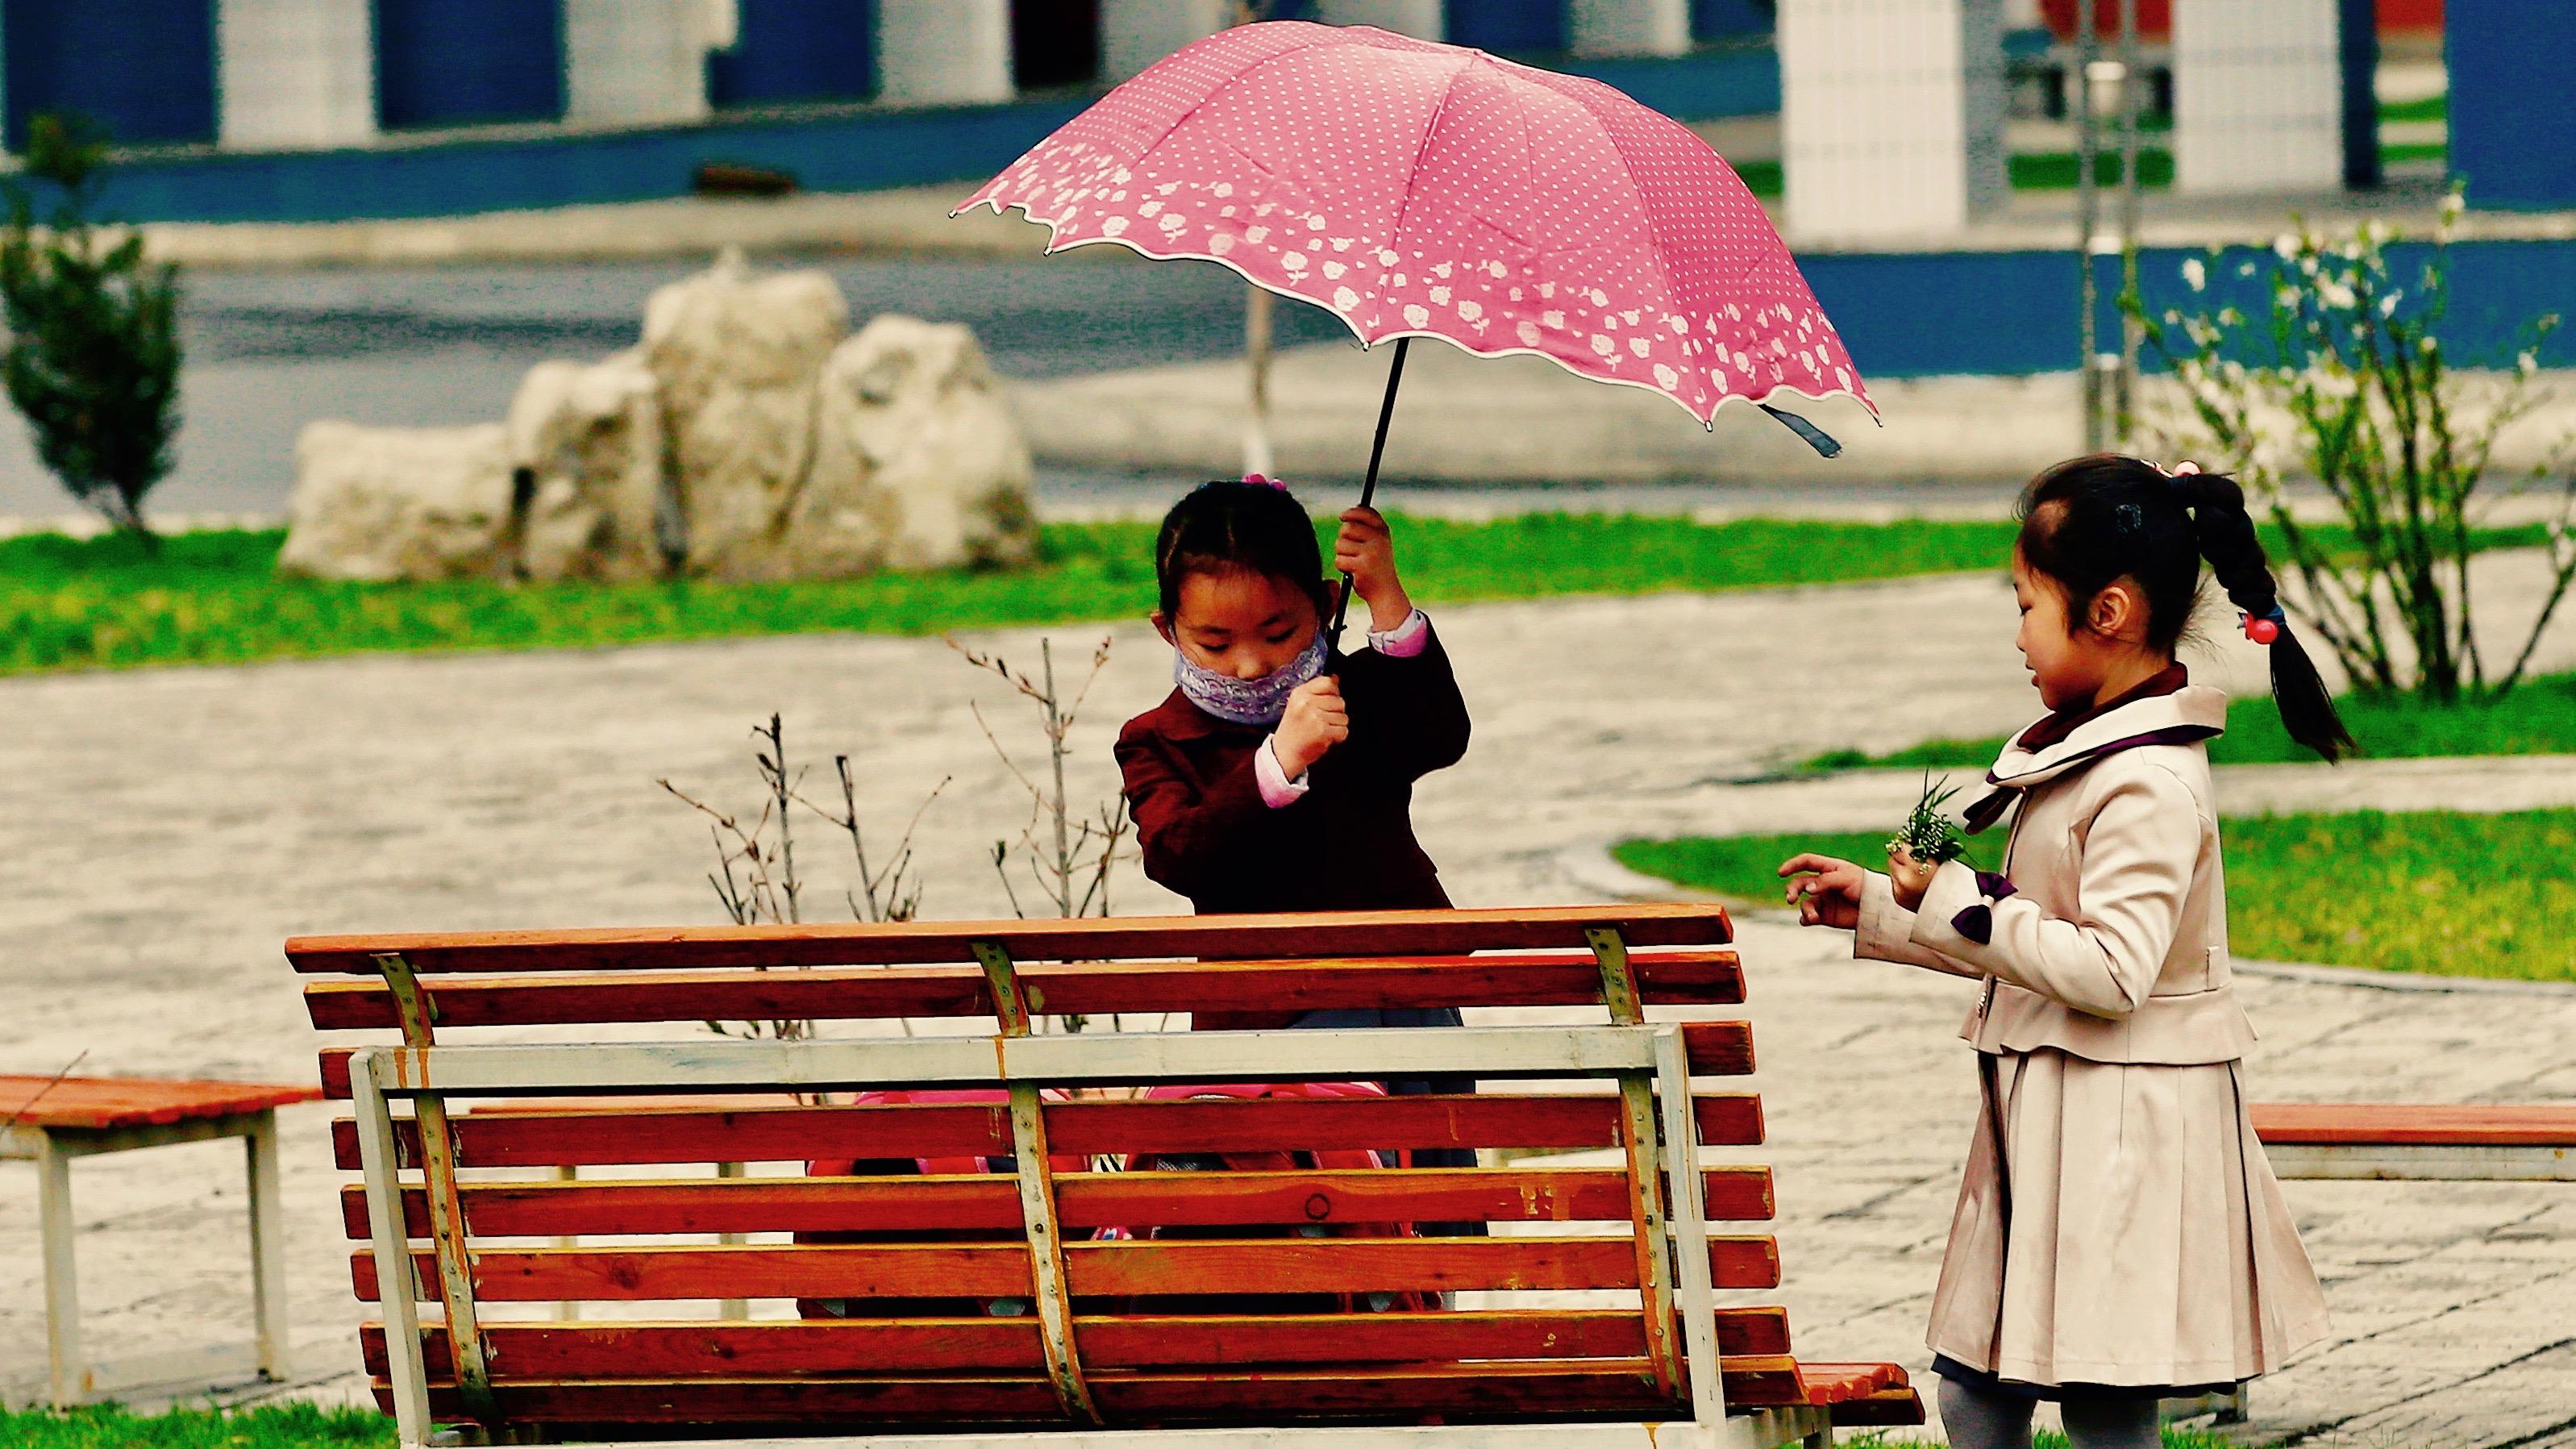 Girl opens umbrella at bench.